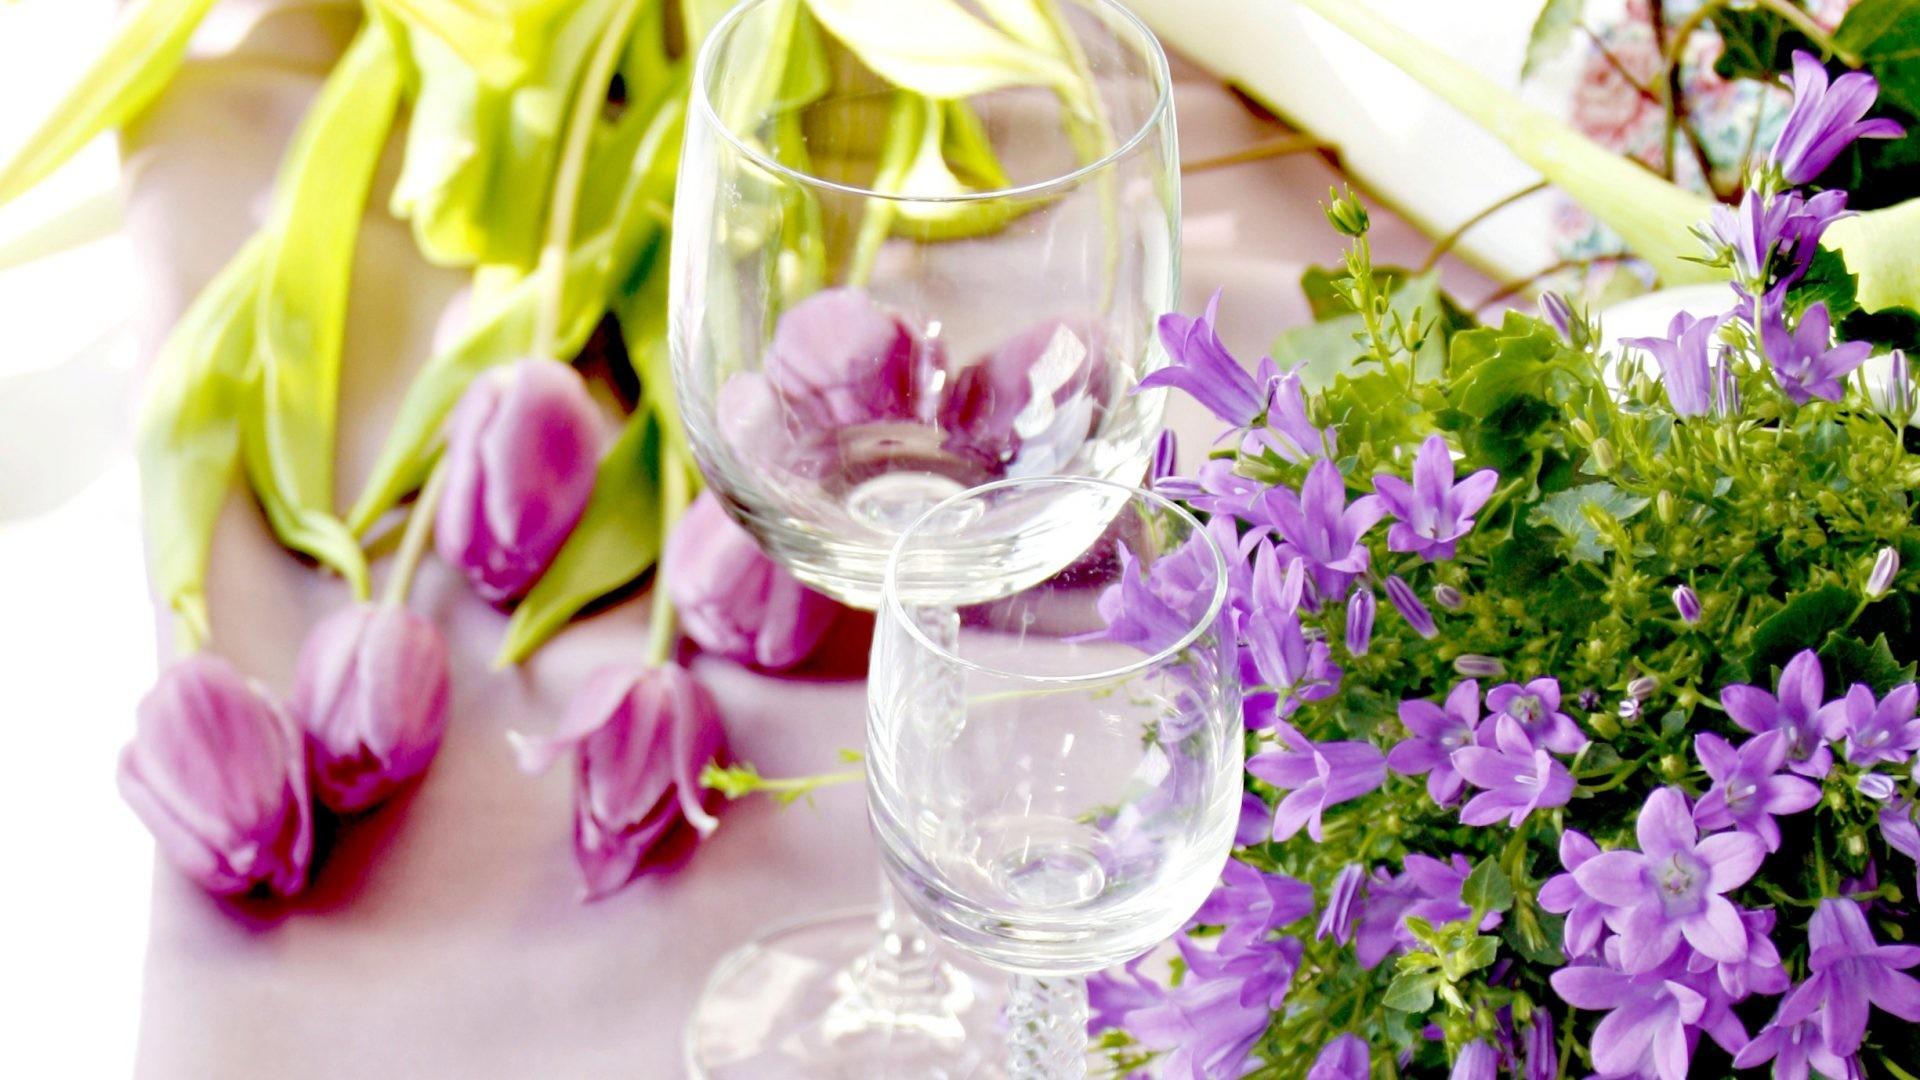 #882277 Color – Tulips Still Life Glass Flowers Beautiful Love Glasses  Romance Tulip Pretty Photography